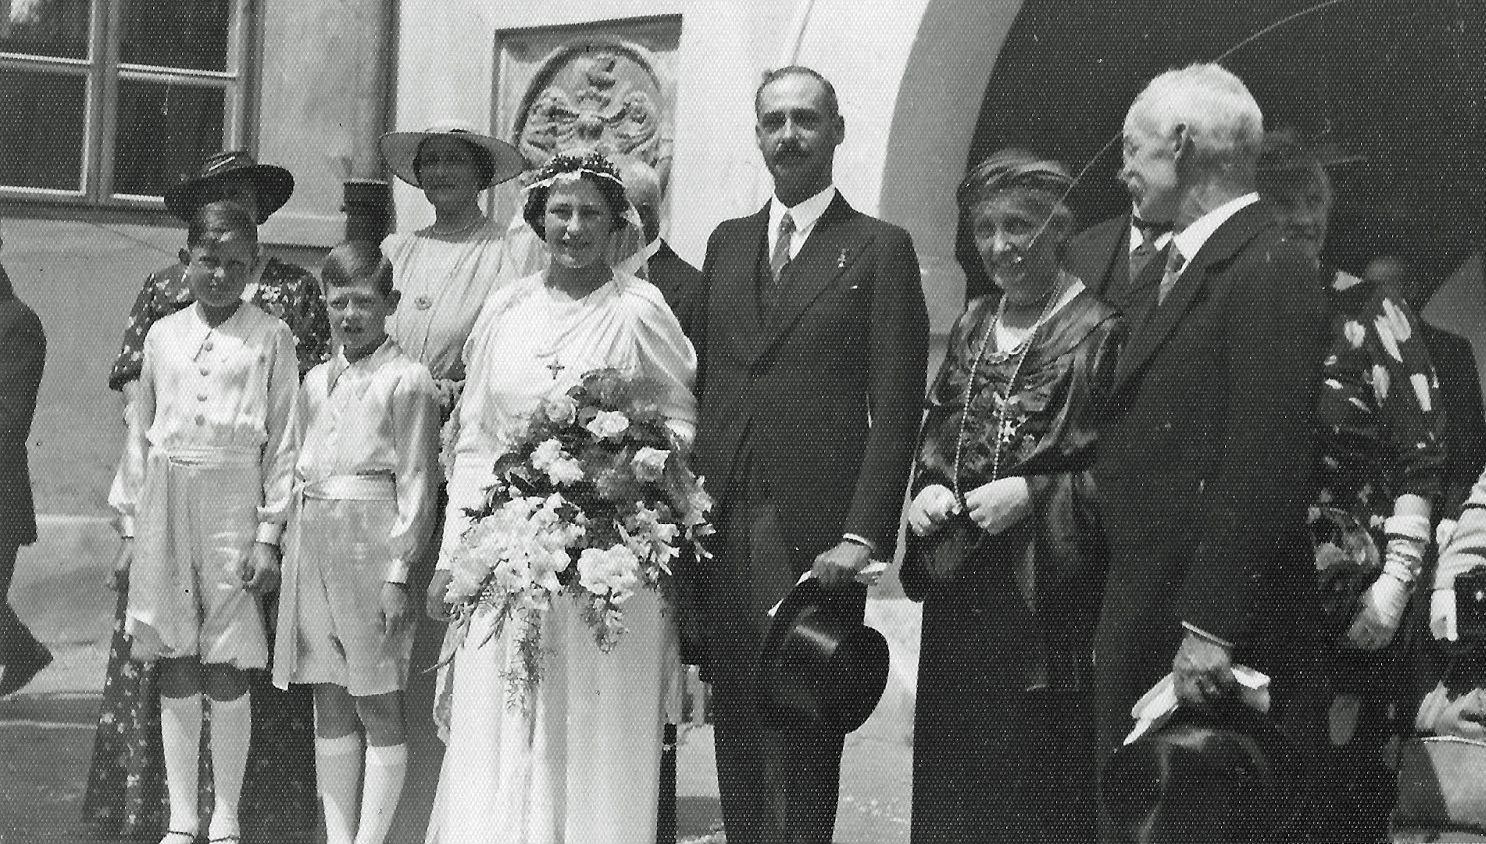 Archduke Gottfried of Austria -Tuscany (1902 - 1984) and Princess Dorothea of Bavaria (1920 – 2015 wedding  2 August 1938  Sárvár, Hungary.